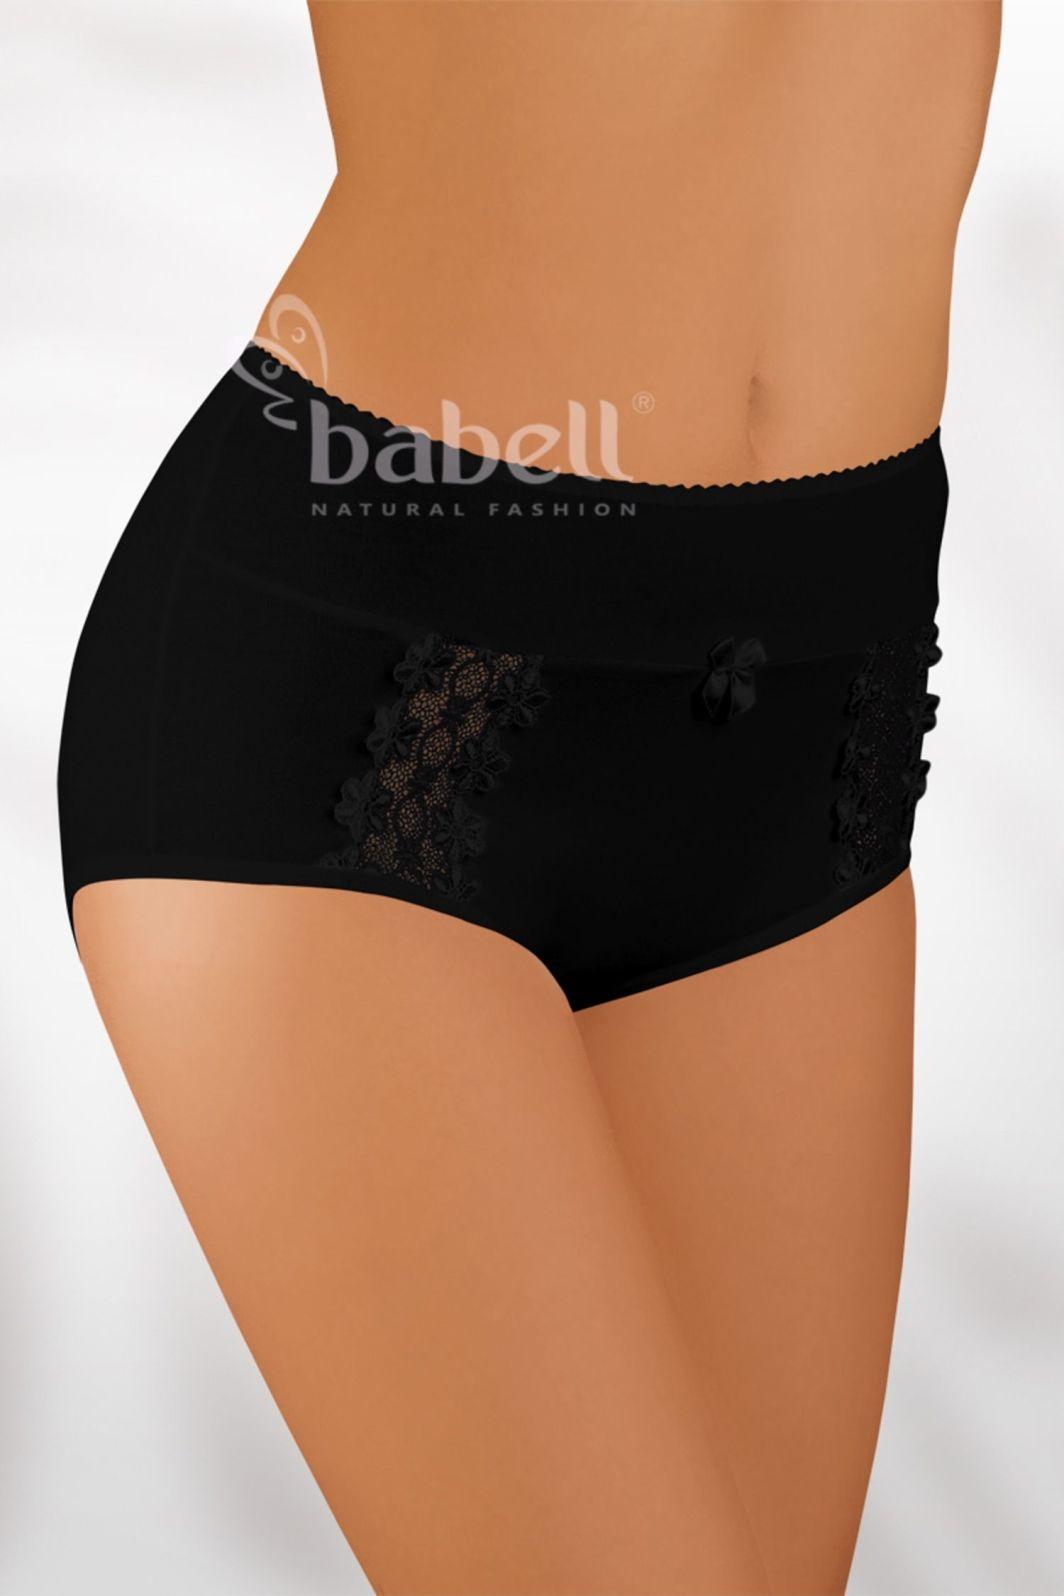 Babell Figi damskie BBL-005 czarne r. L 1